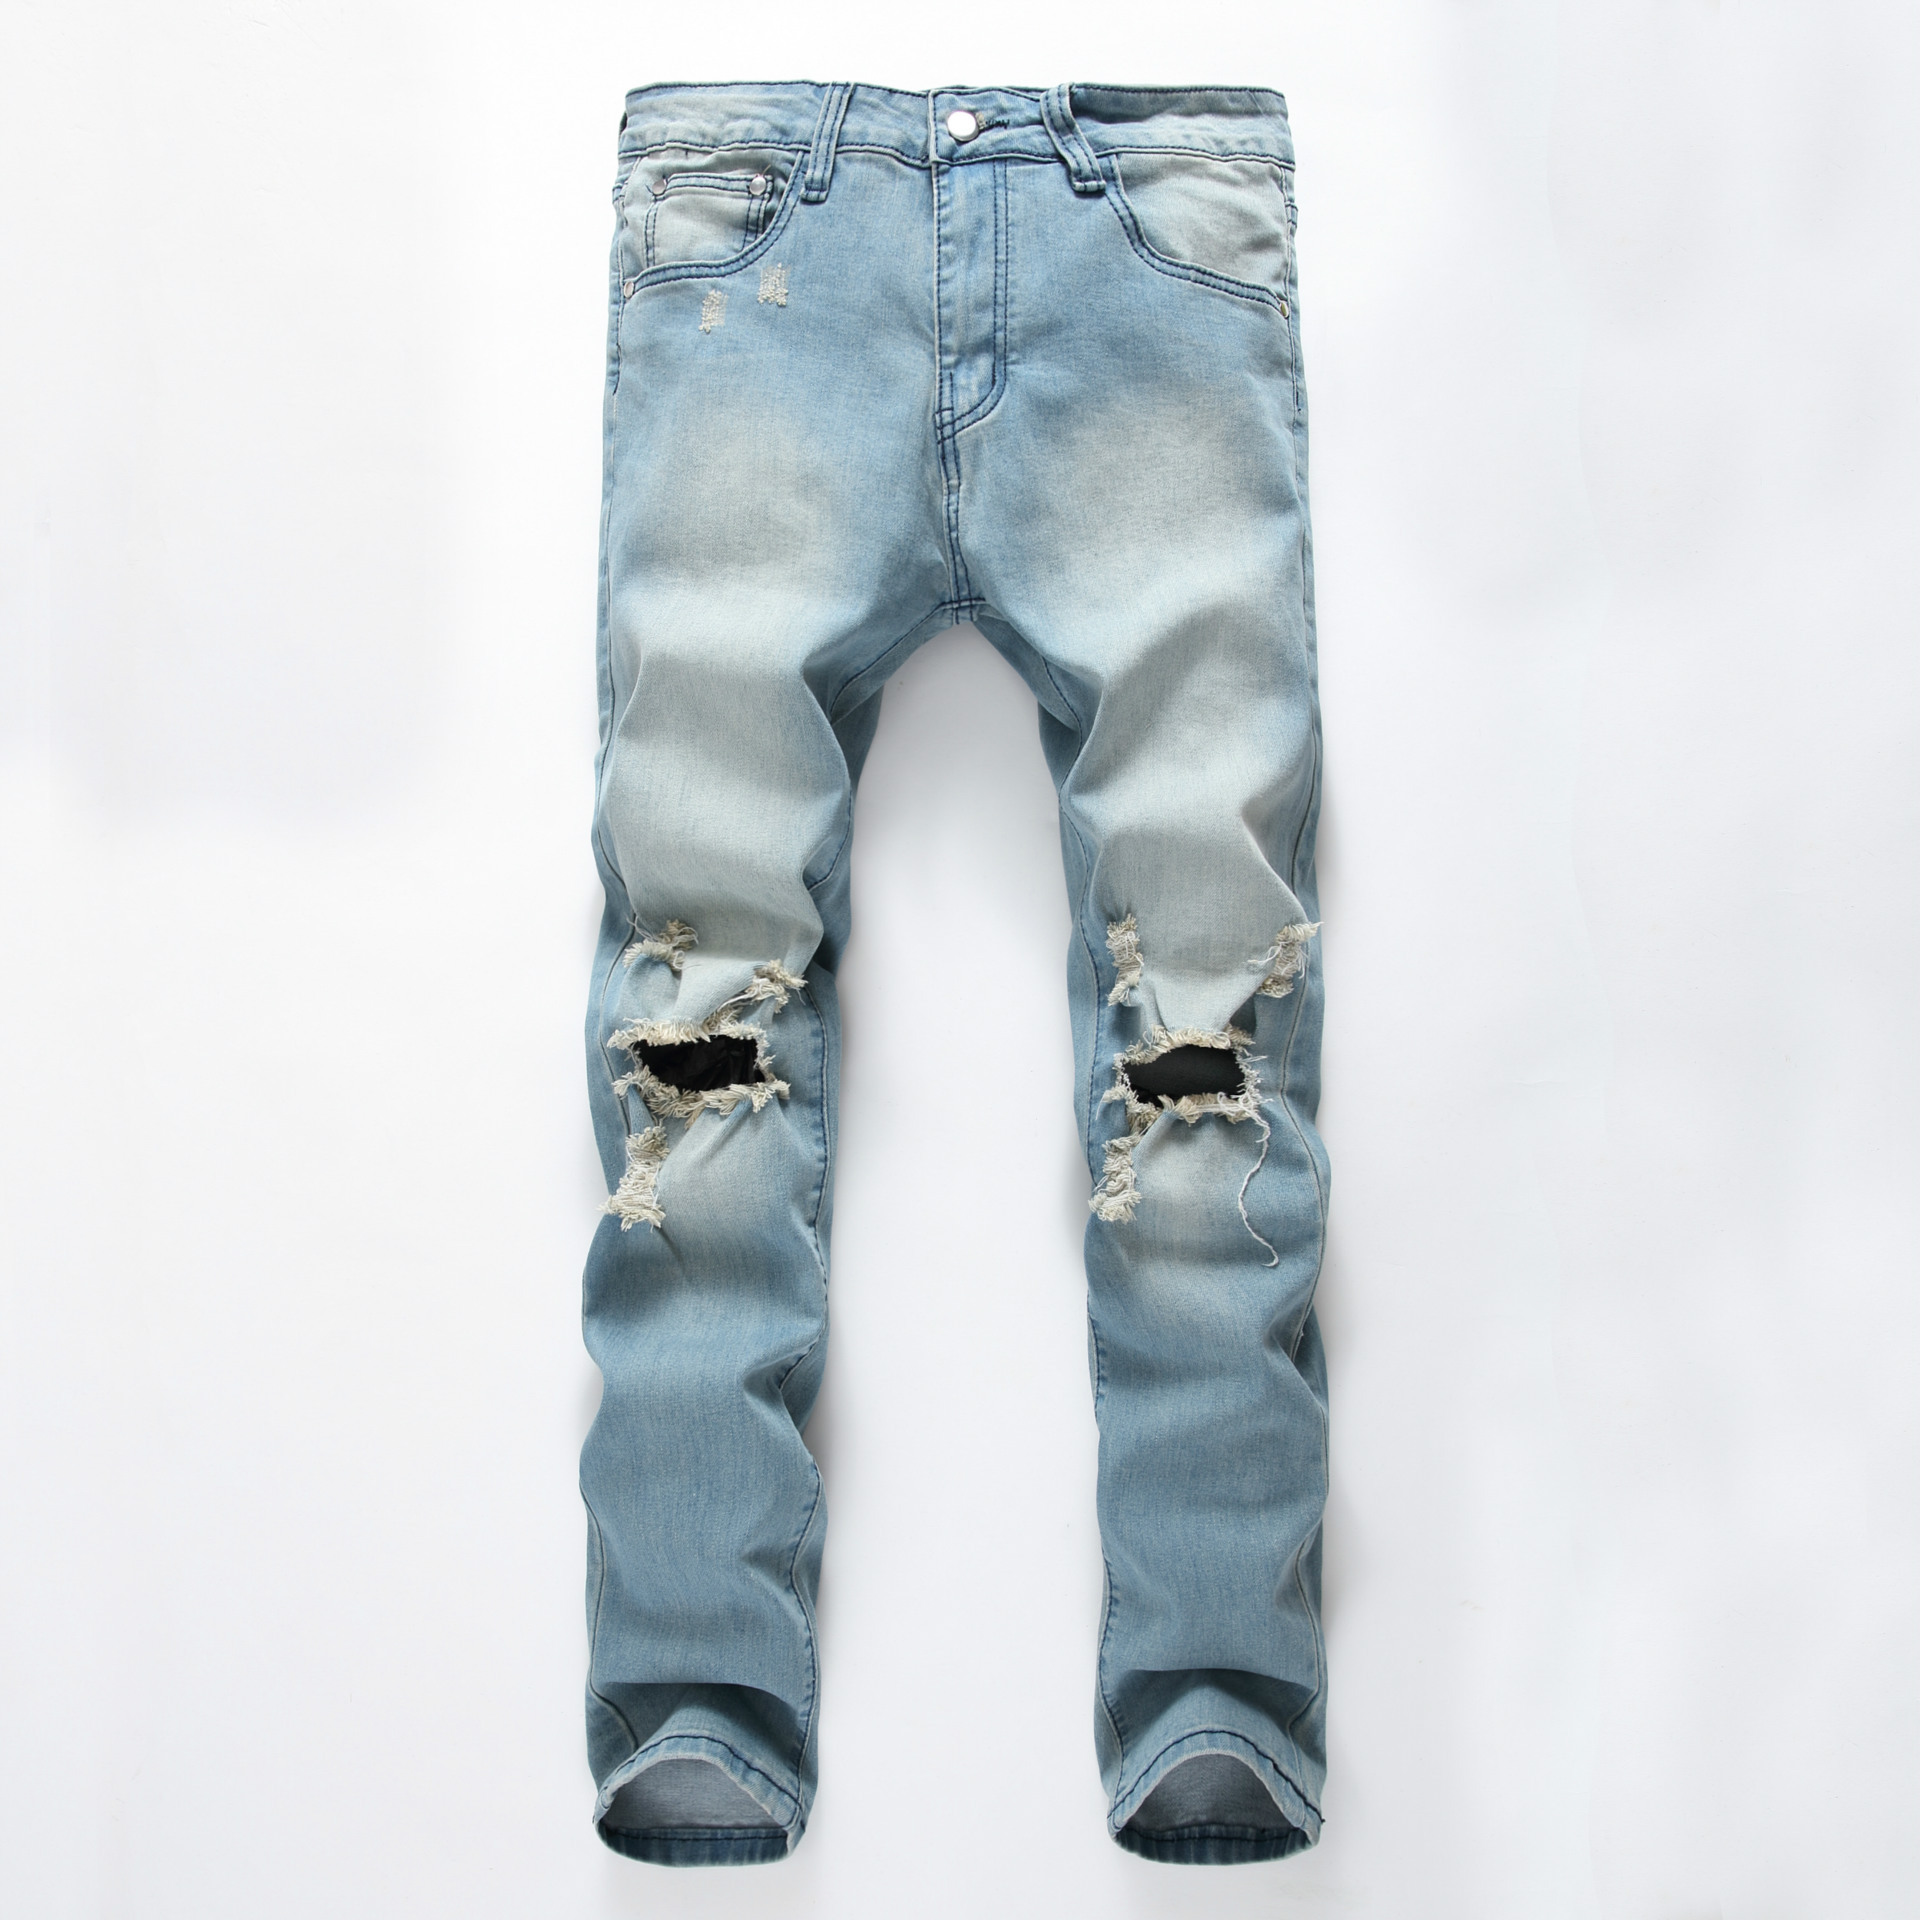 Men's Jeans-Hot Selling With Holes Nostalgic Large Tattered Men'S Wear Cowboy Pants